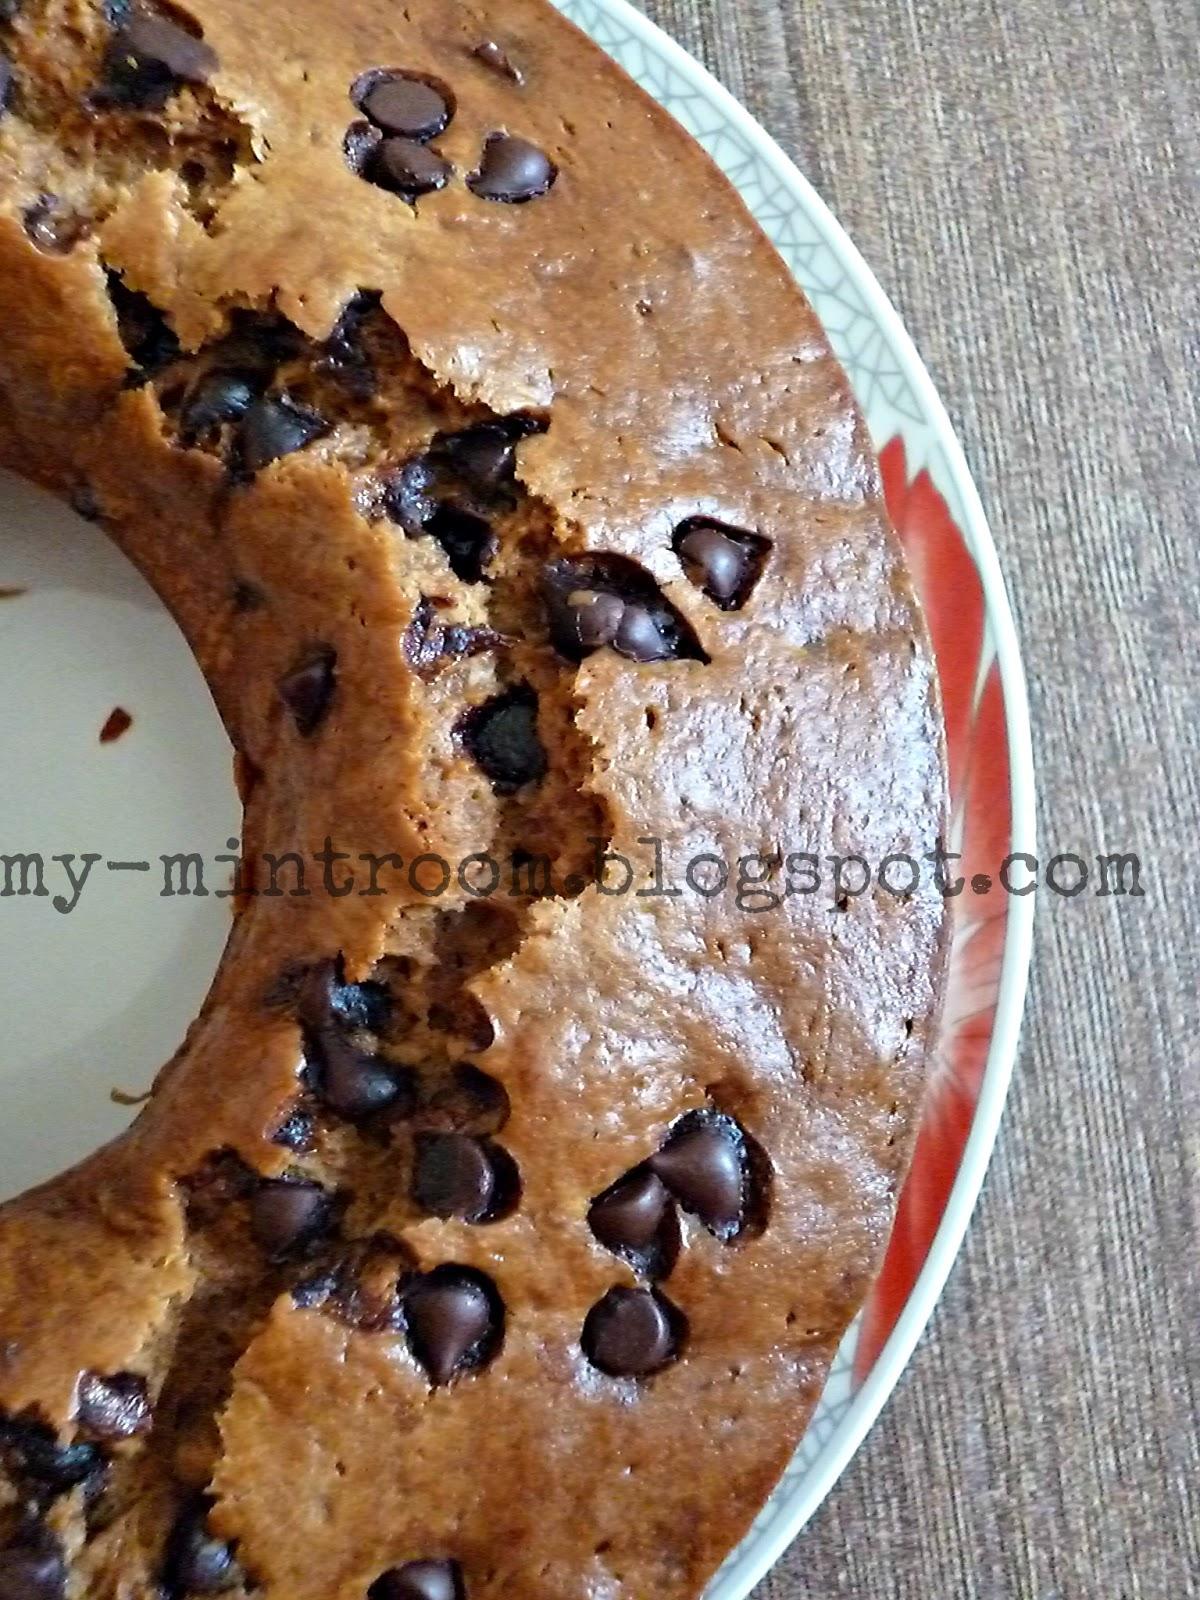 Chocolate Chip Coffee Cake Recipe In Bundt Pan